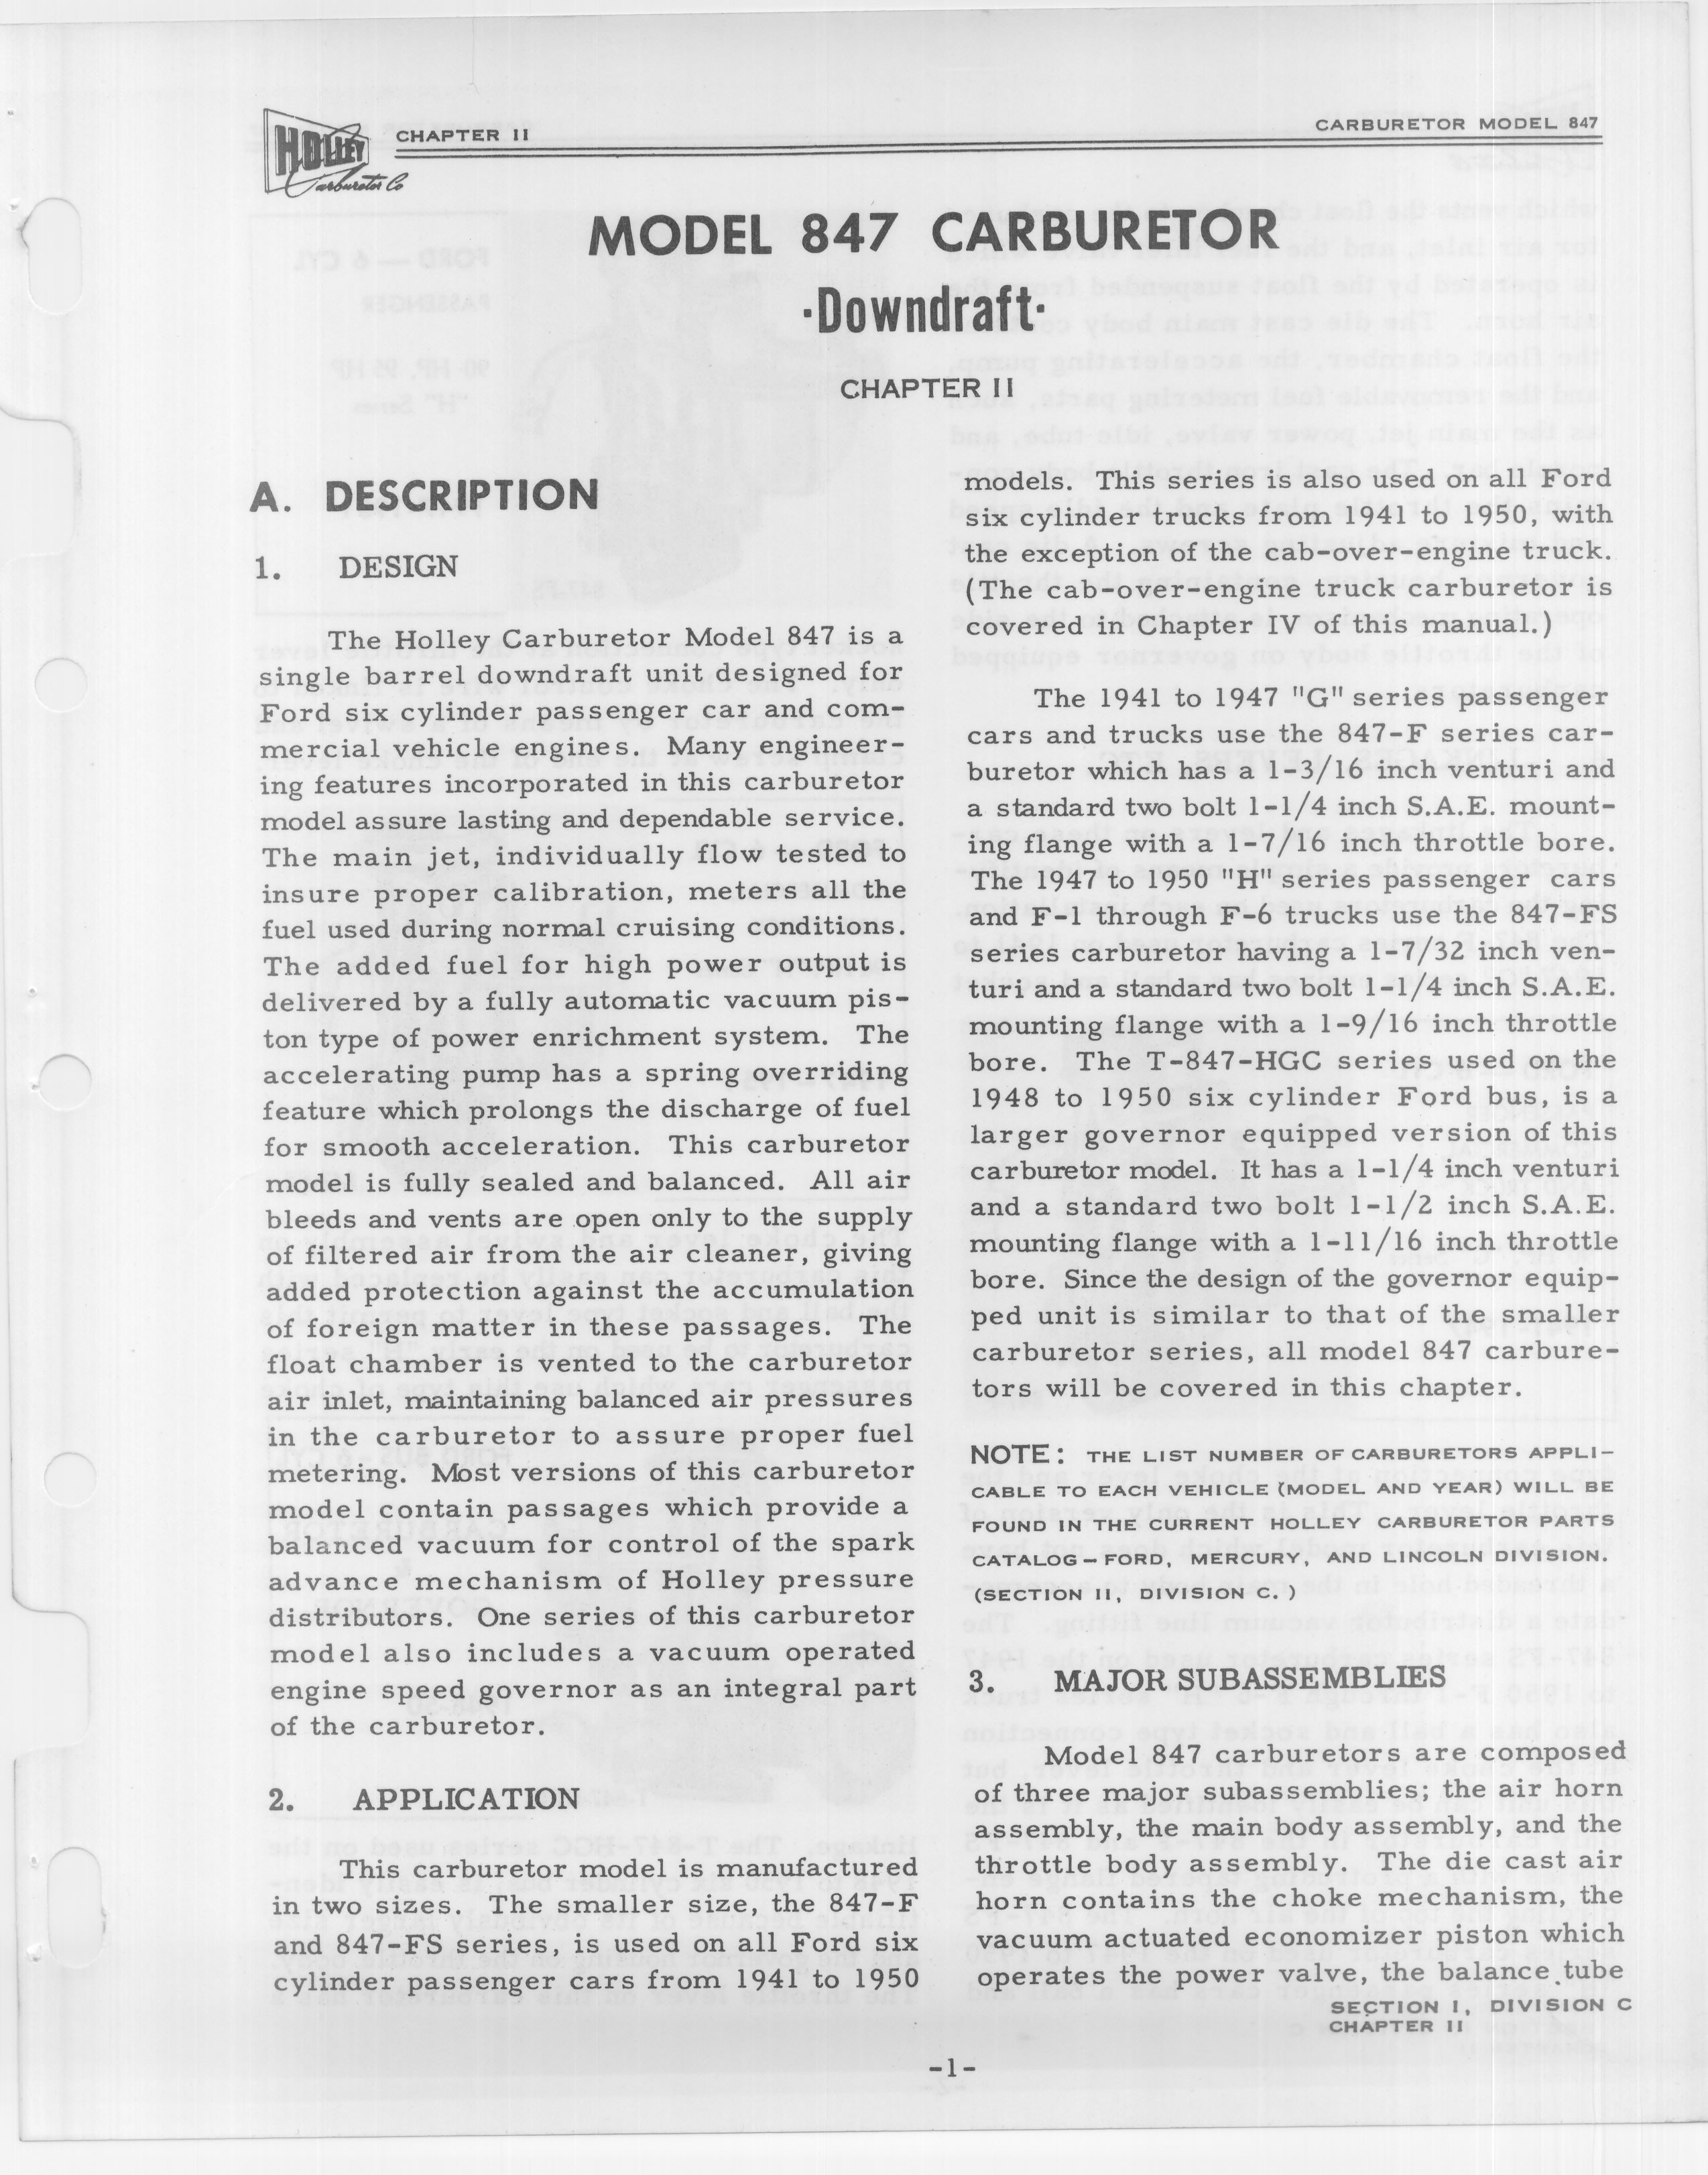 Holley 847 Downdraft Service Manual / H847-19500005.jpg